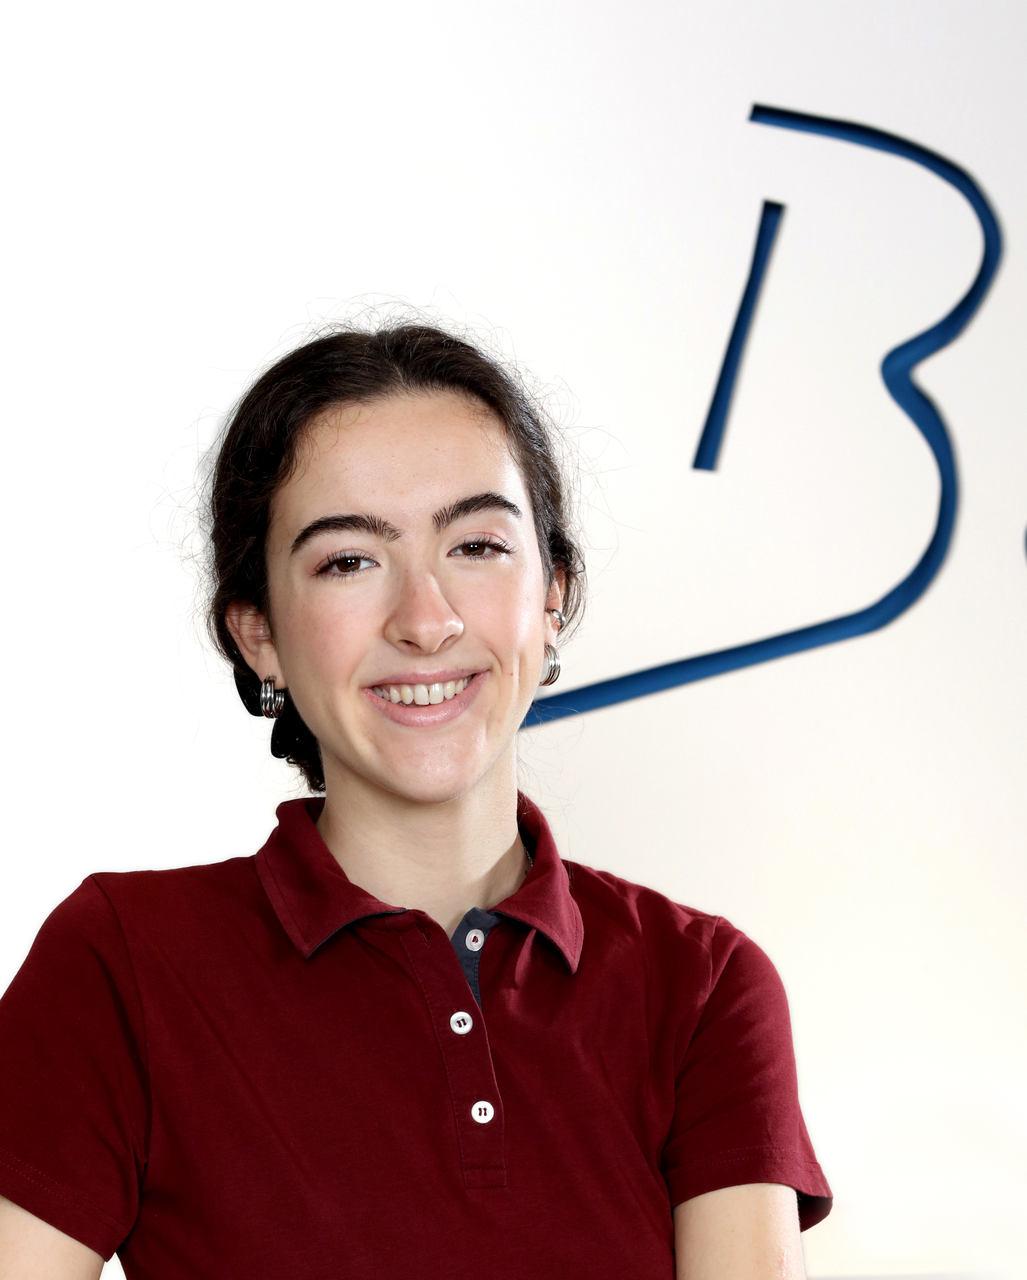 Marlene Beil